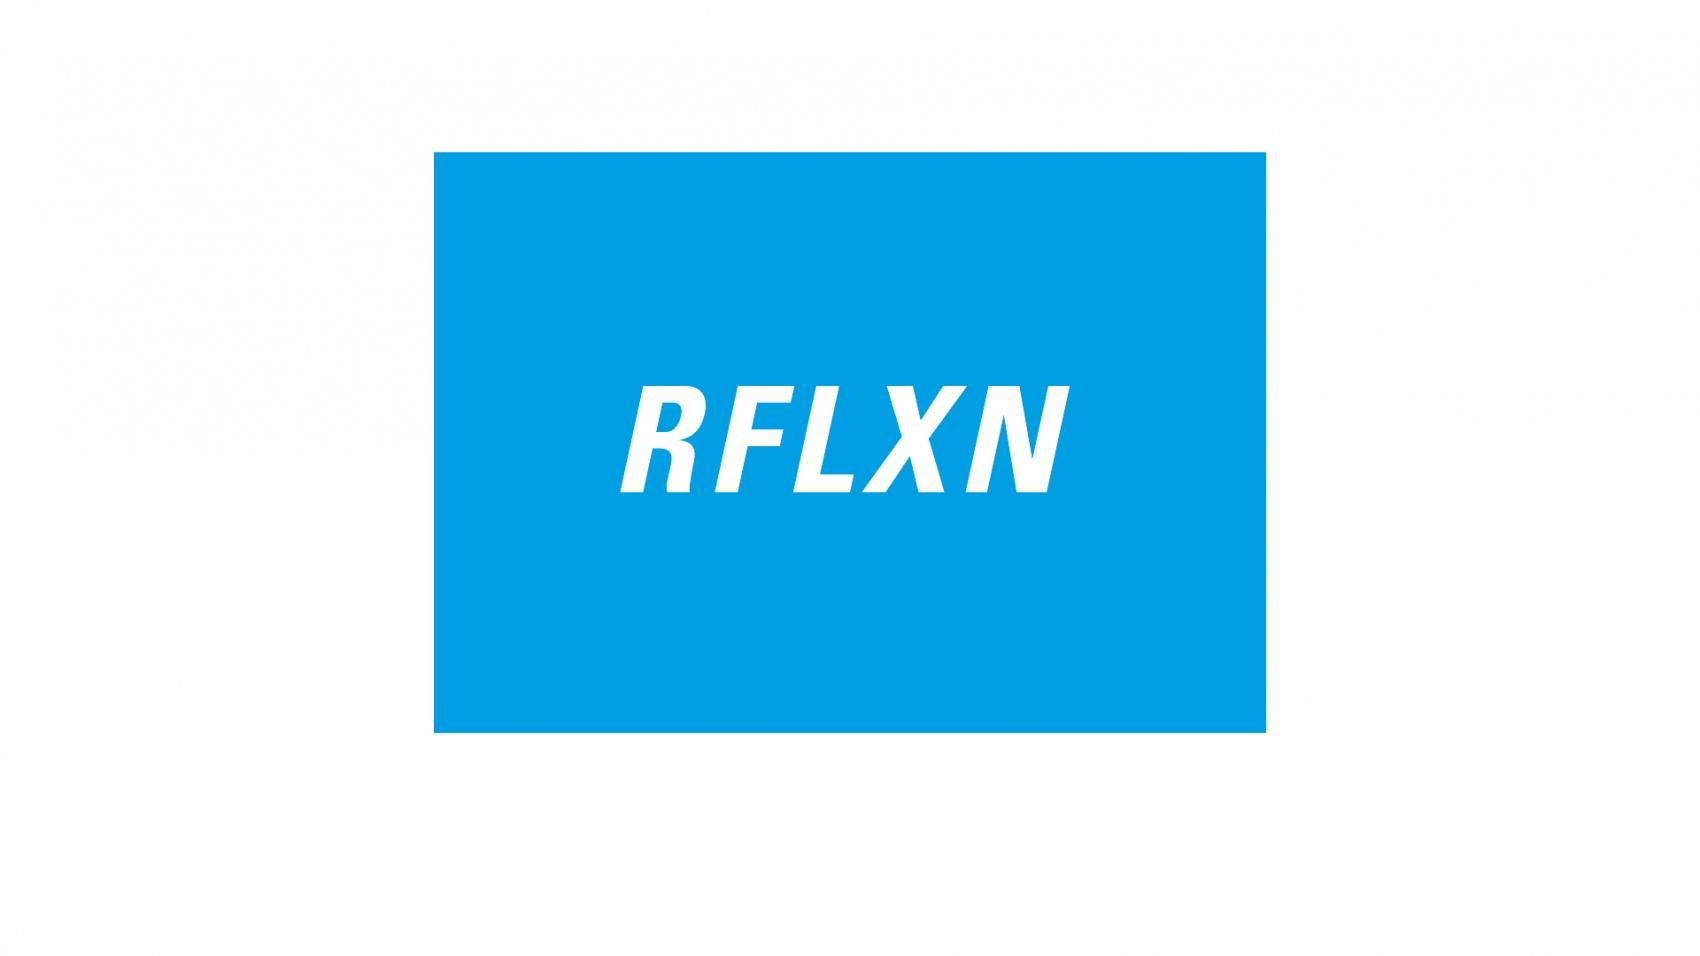 FOTO-REFLEXIONEN > RFLXN_6